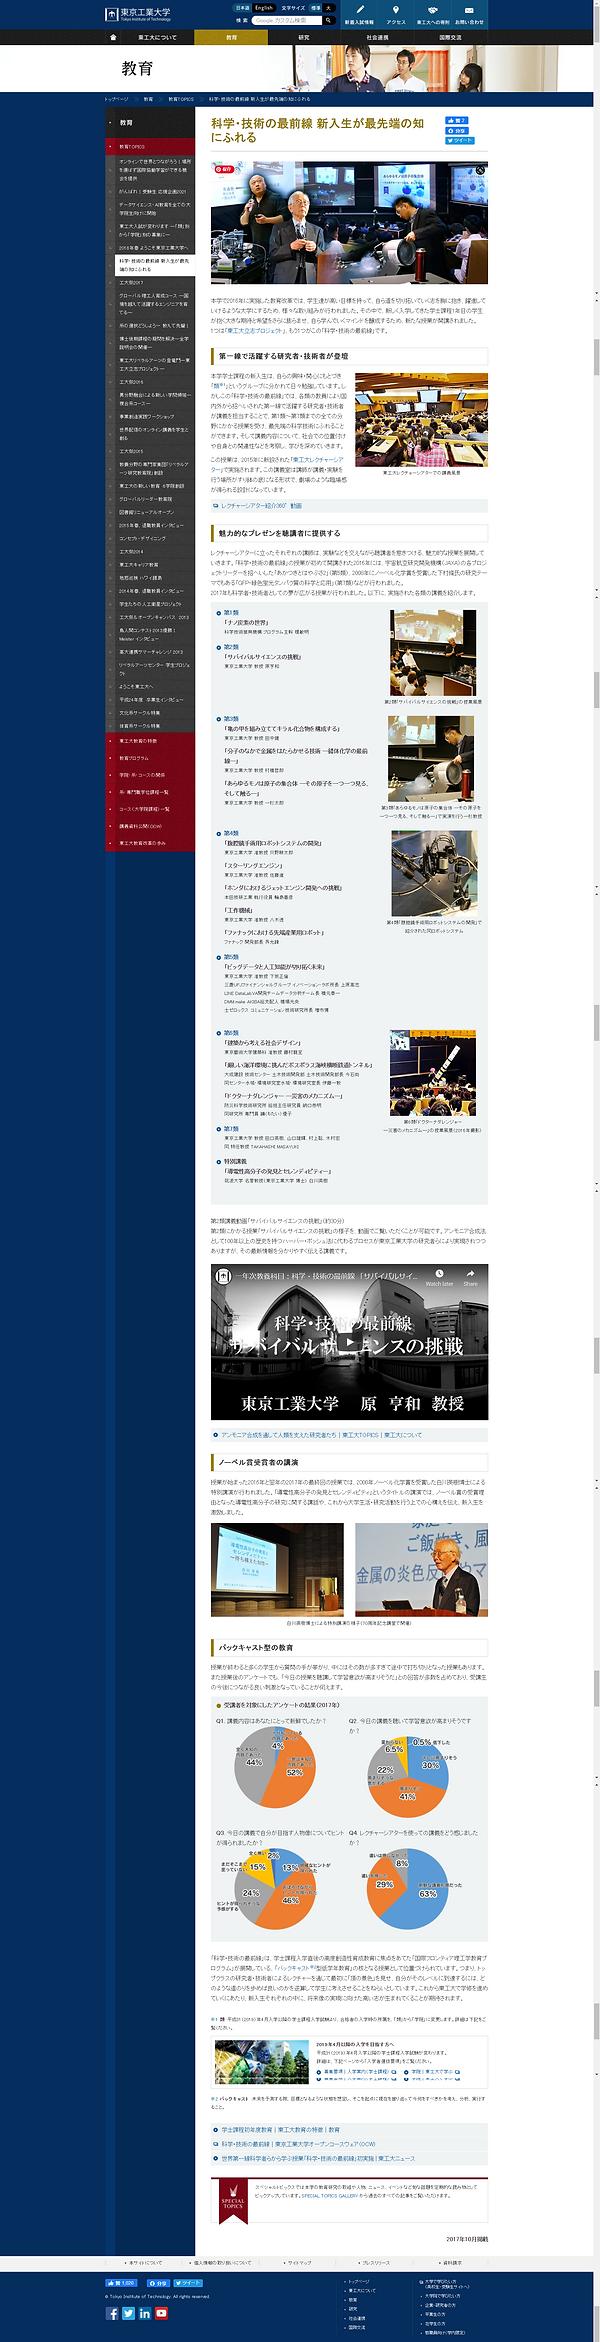 Screenshot (18).png